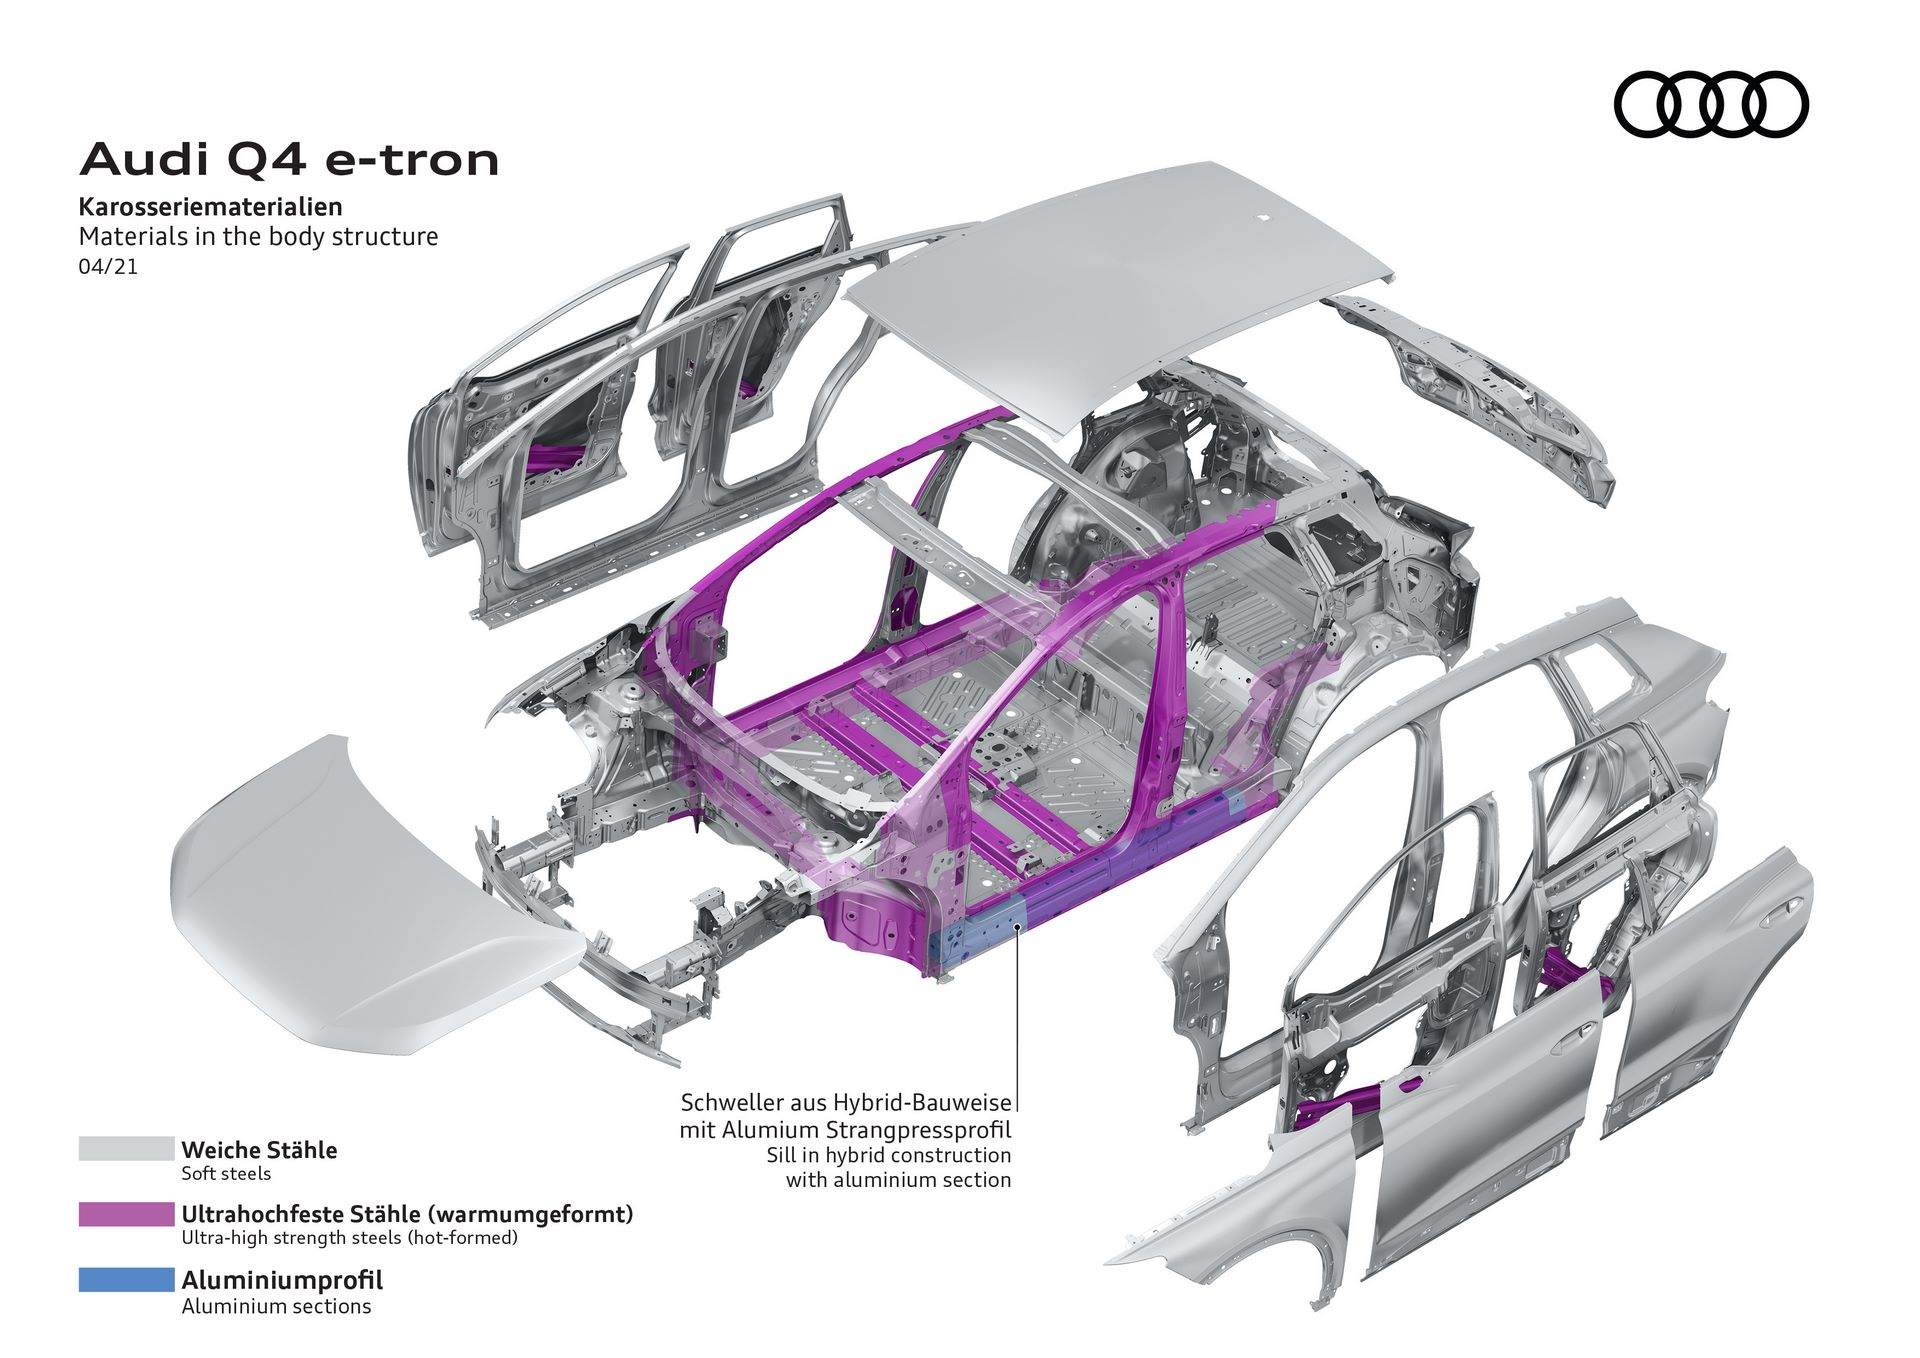 Audi-Q4-e-tron-and-Q4-e-tron-Sportback-110